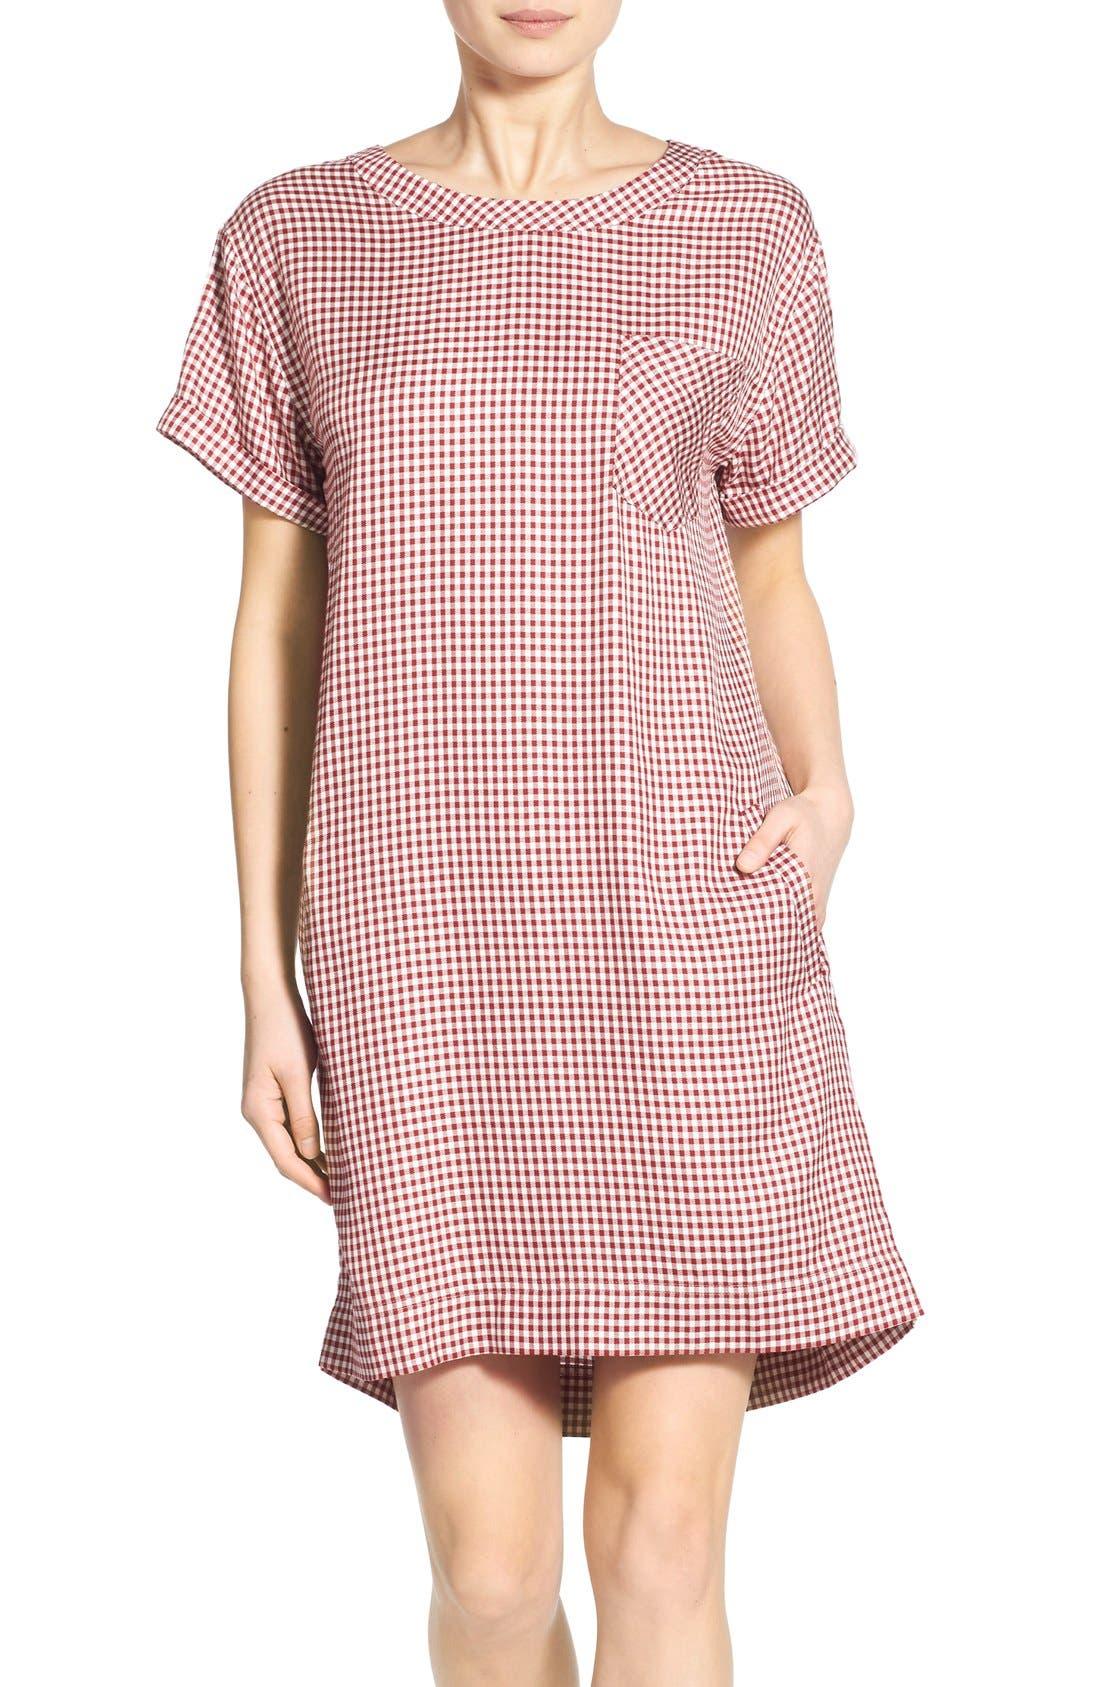 Alternate Image 1 Selected - Madewell 'Filmscore' Gingham Check Shirt-Sleeve Dress